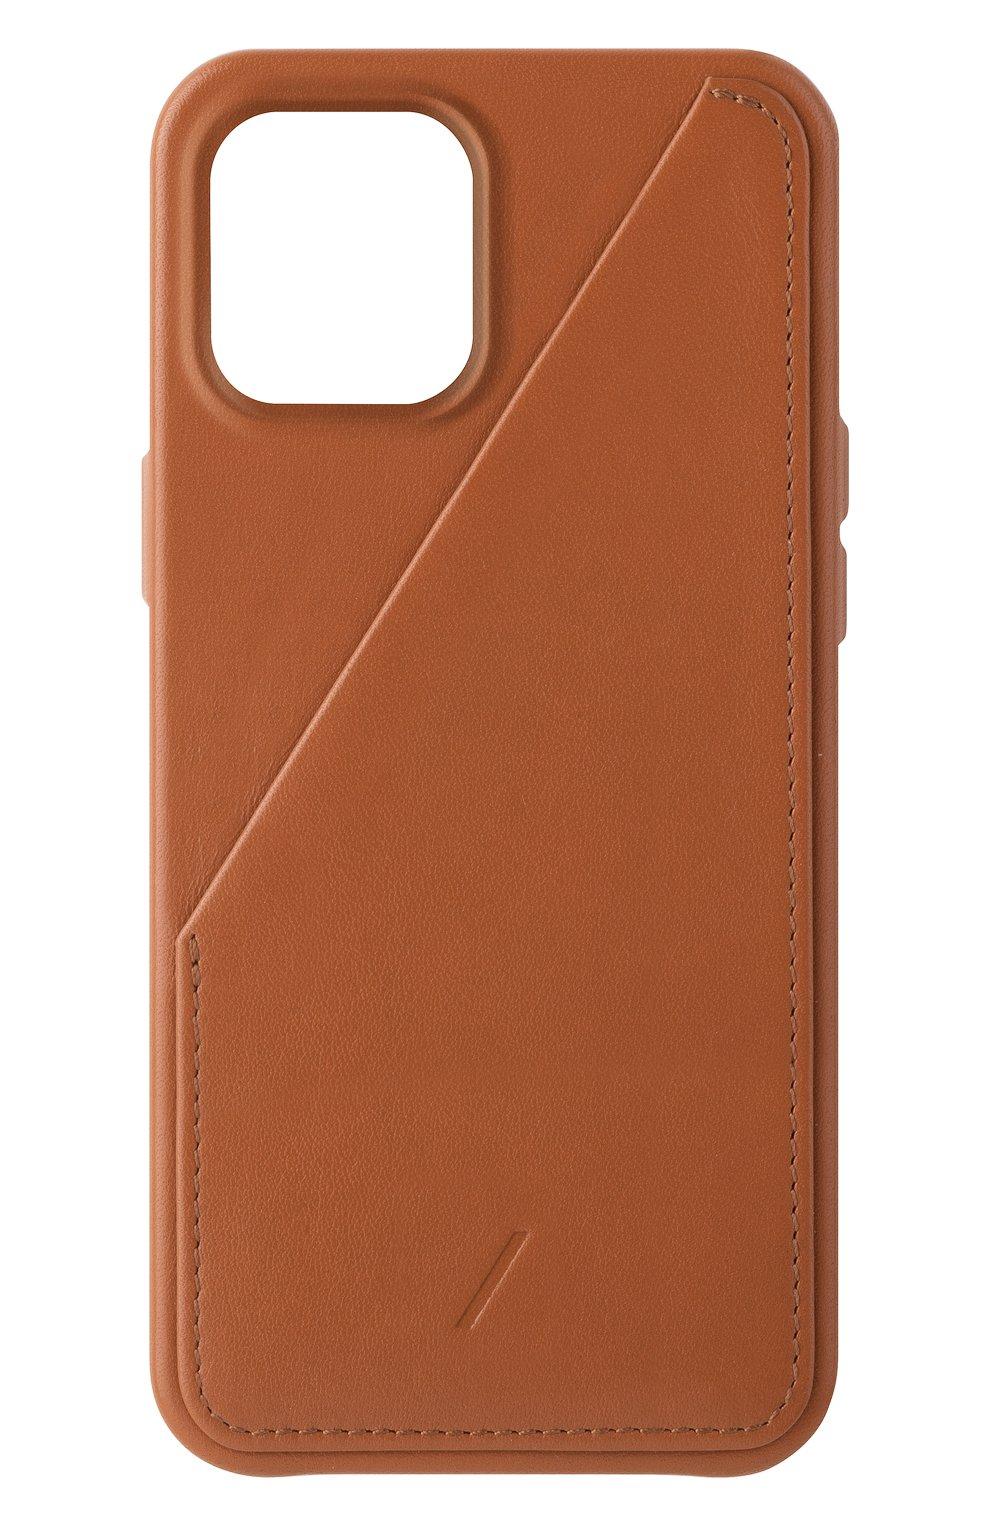 Чехол clic card для iphone 12 pro max  NATIVE UNION коричневого цвета, арт. CCARD-TAN-NP20L | Фото 1